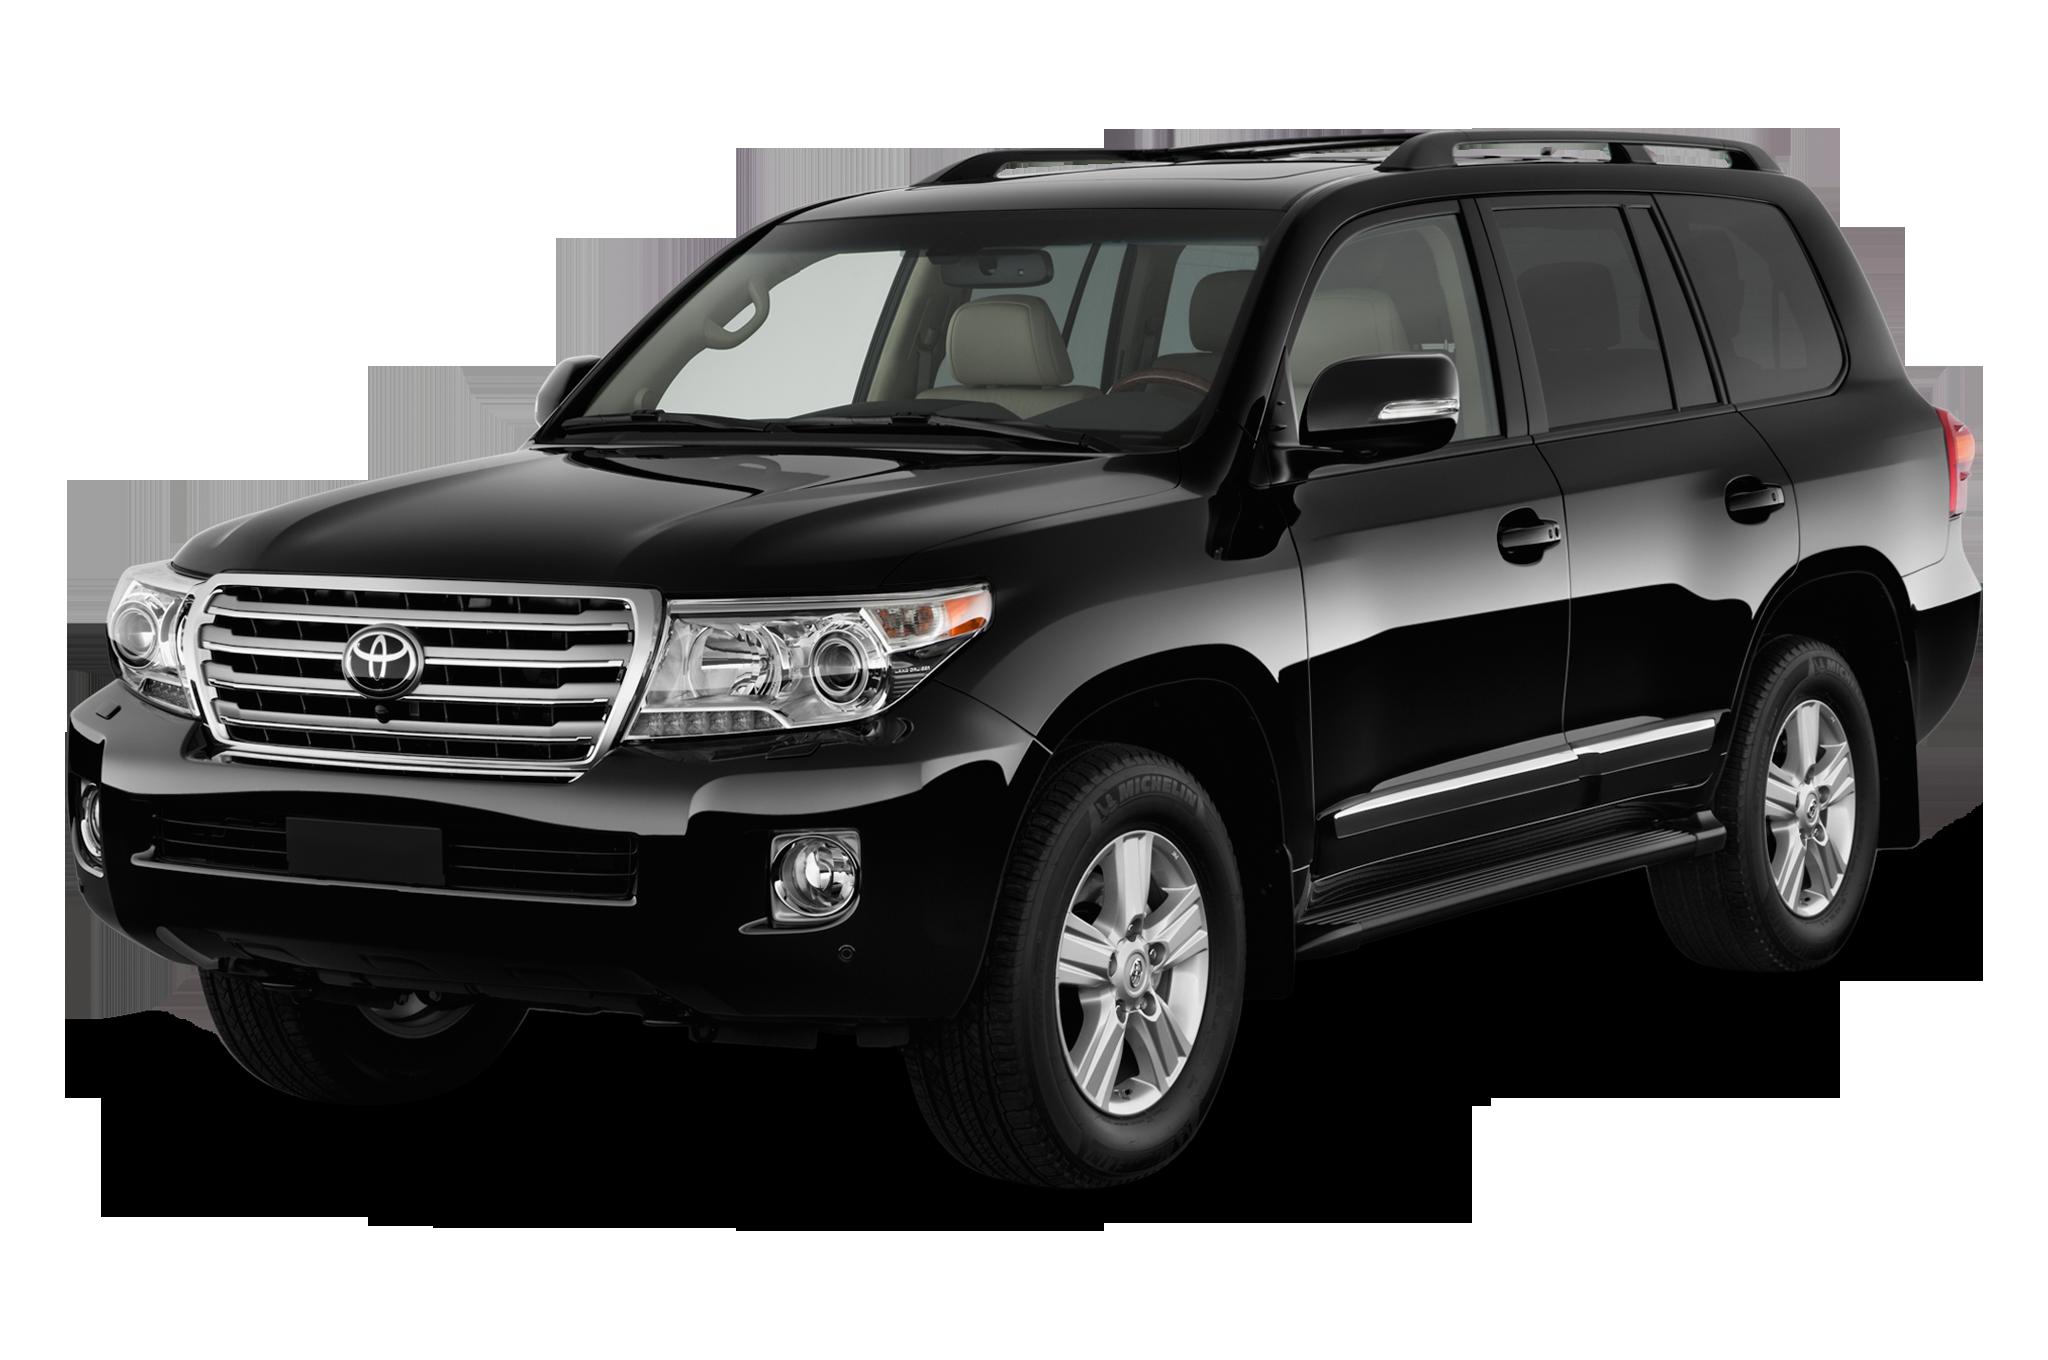 Toyota Land Cruiser 200 (2013-2015)